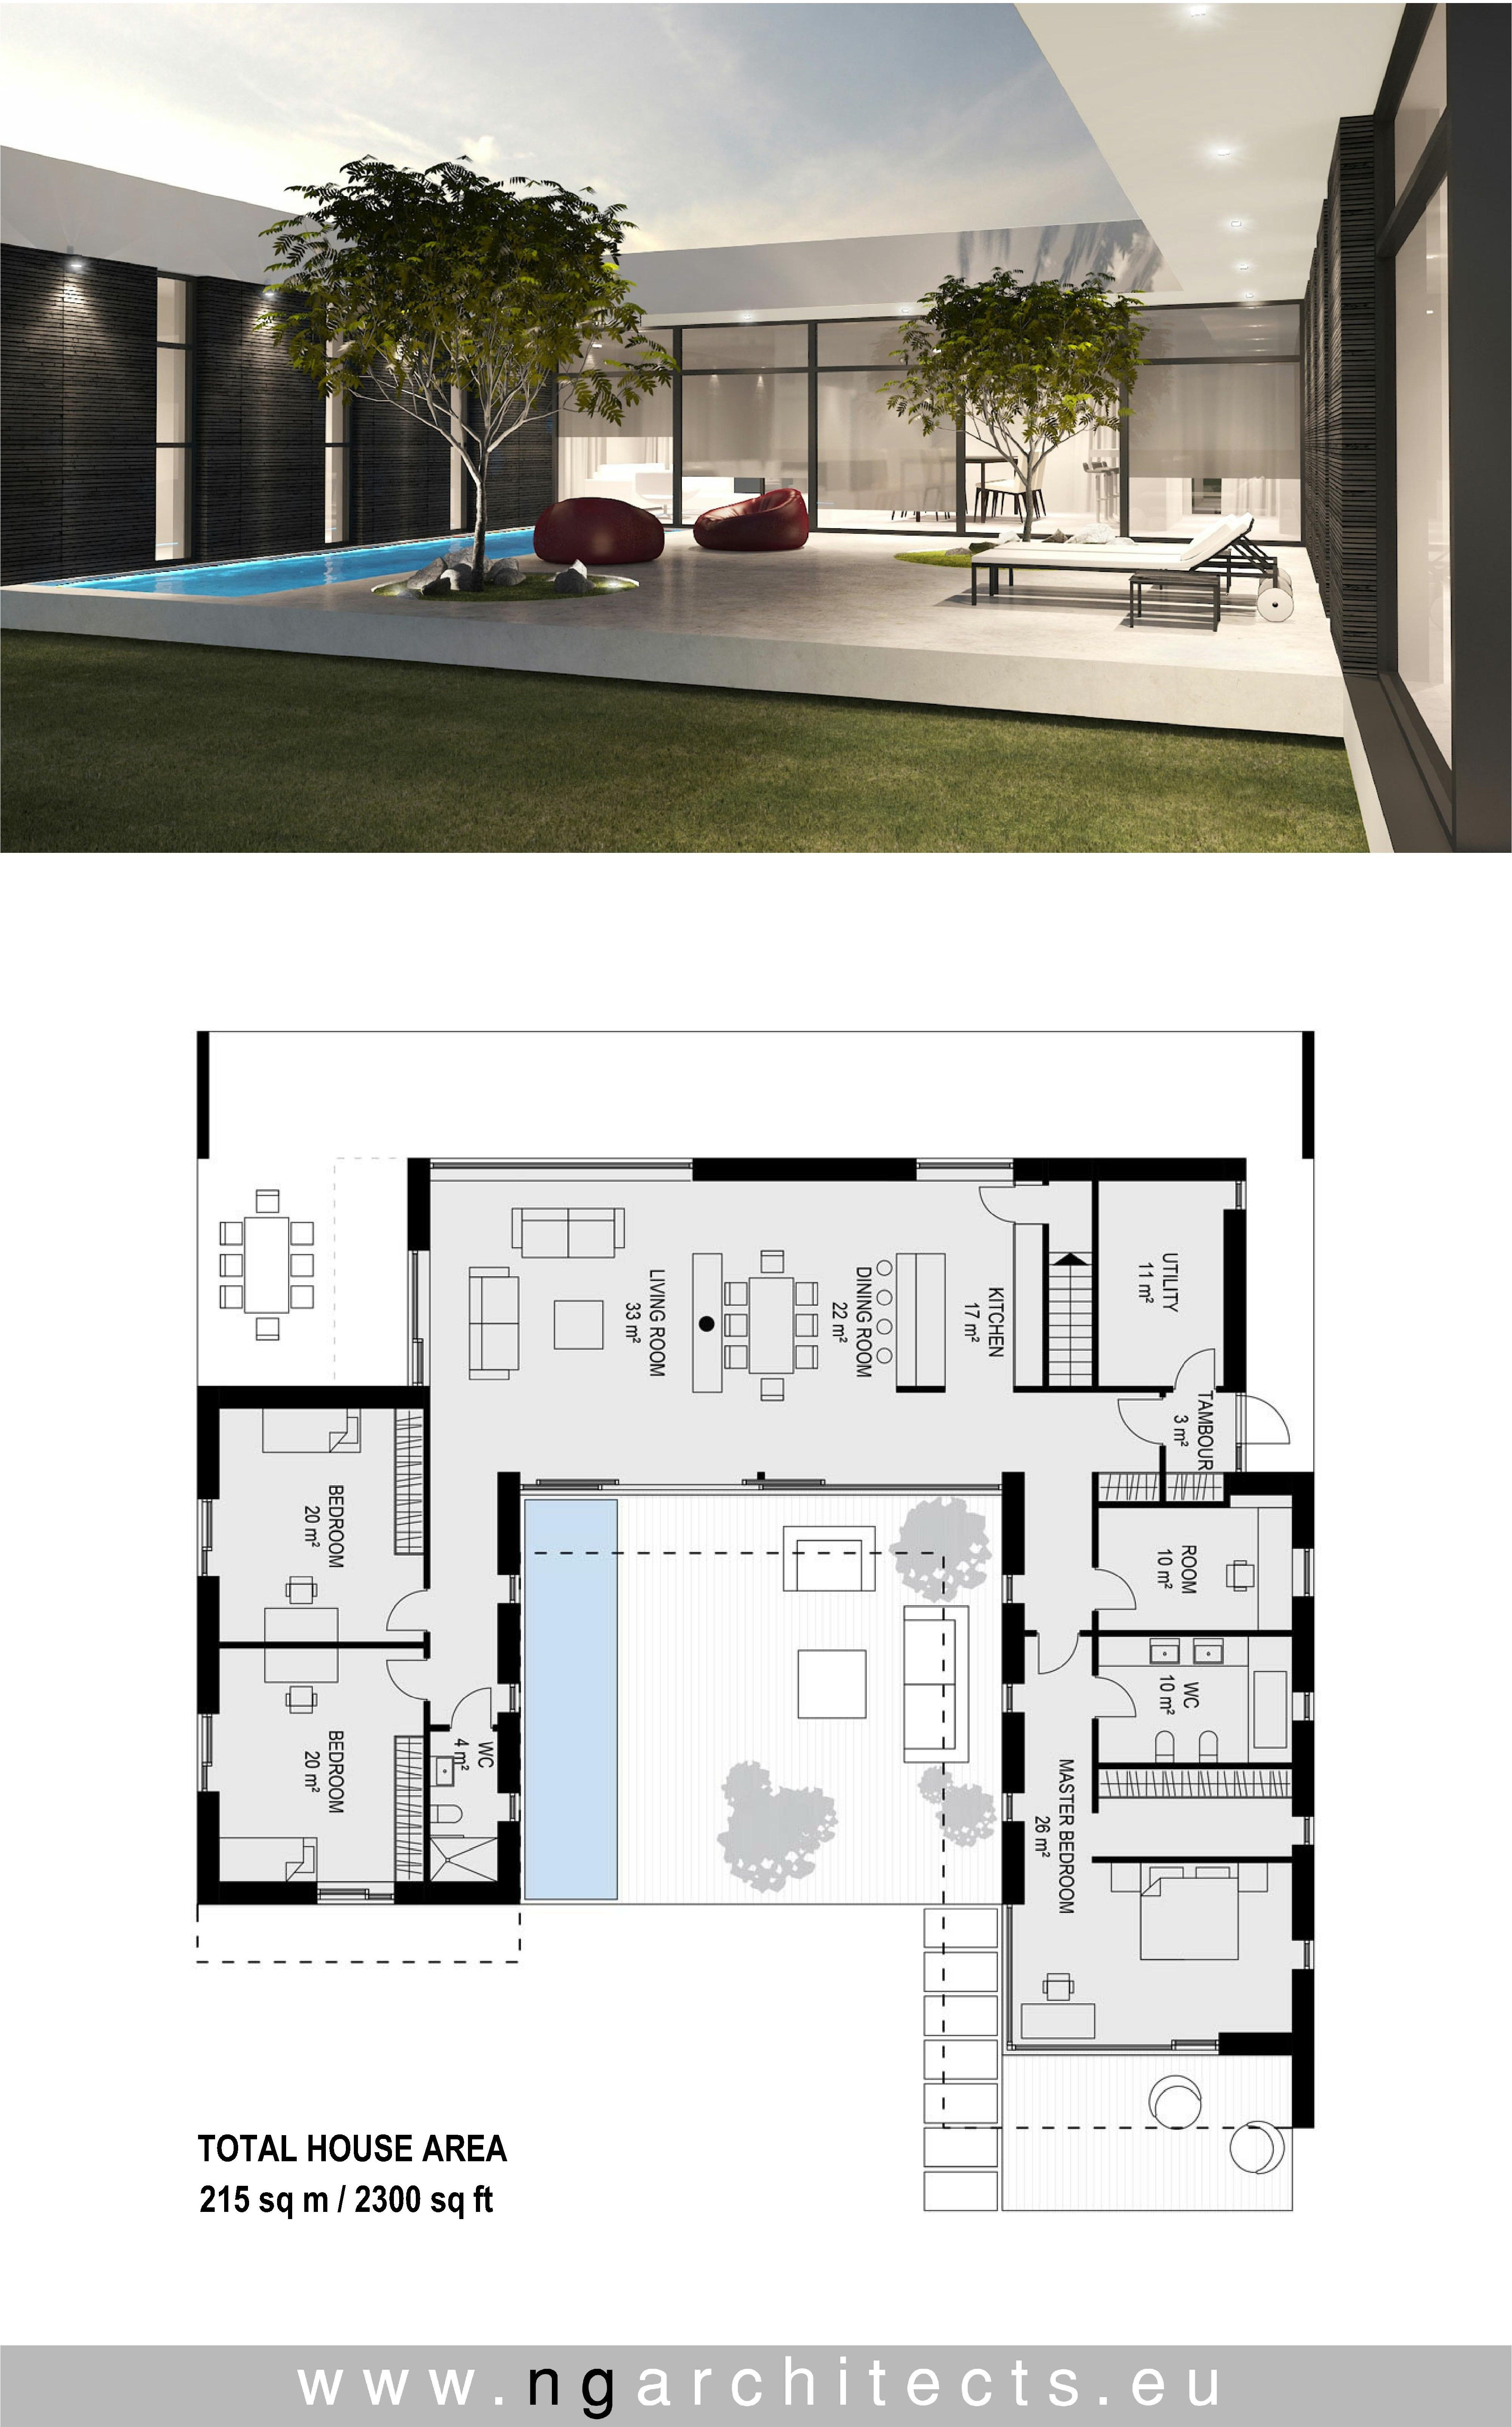 Modern villa aj designed by ng architects www ngarchitects eu